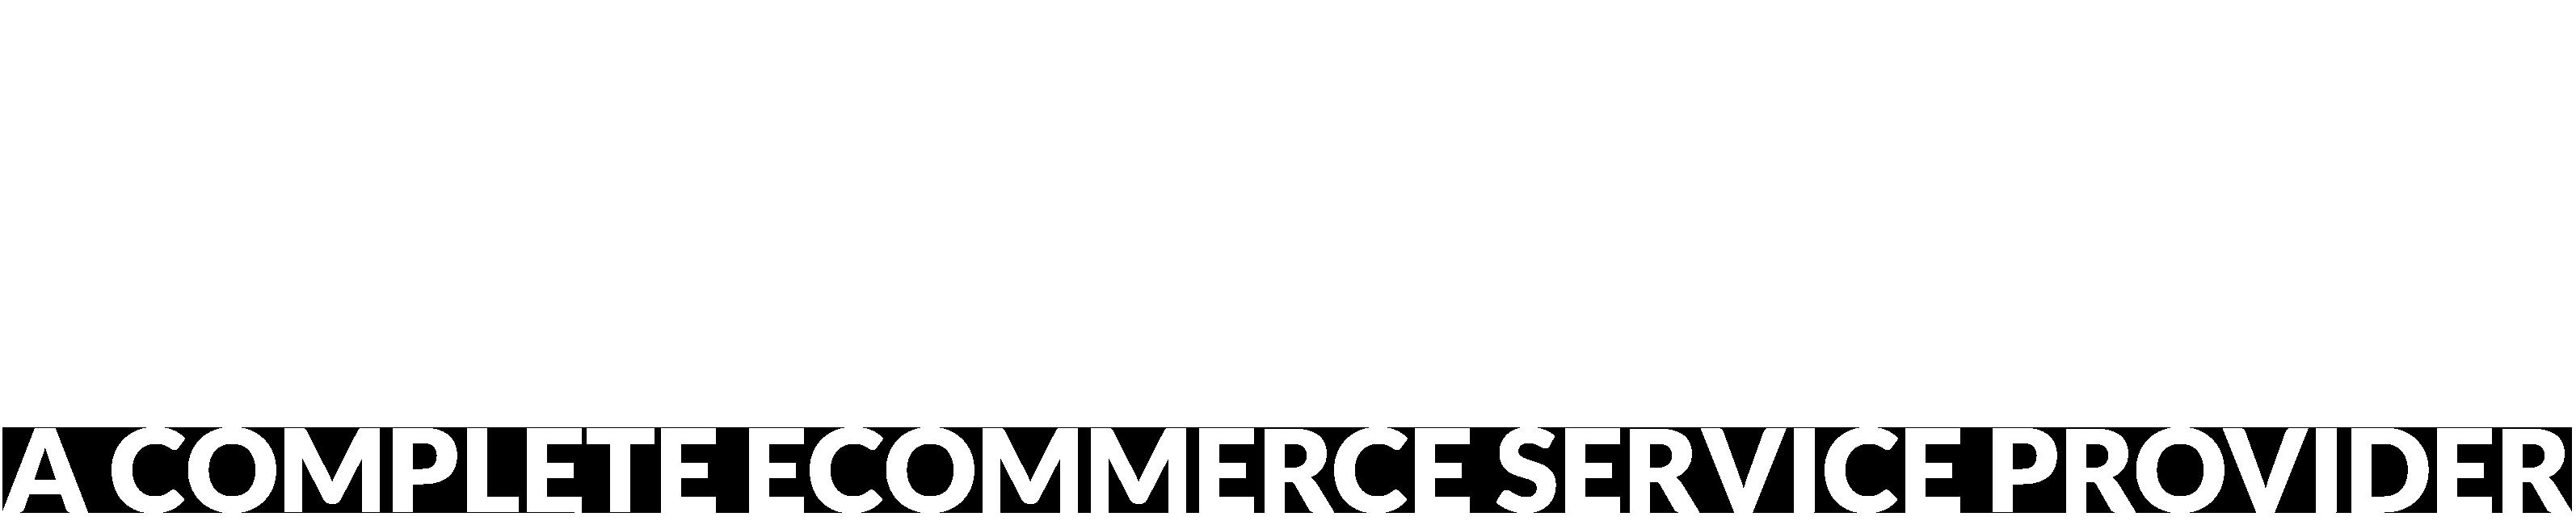 coduzion-logo